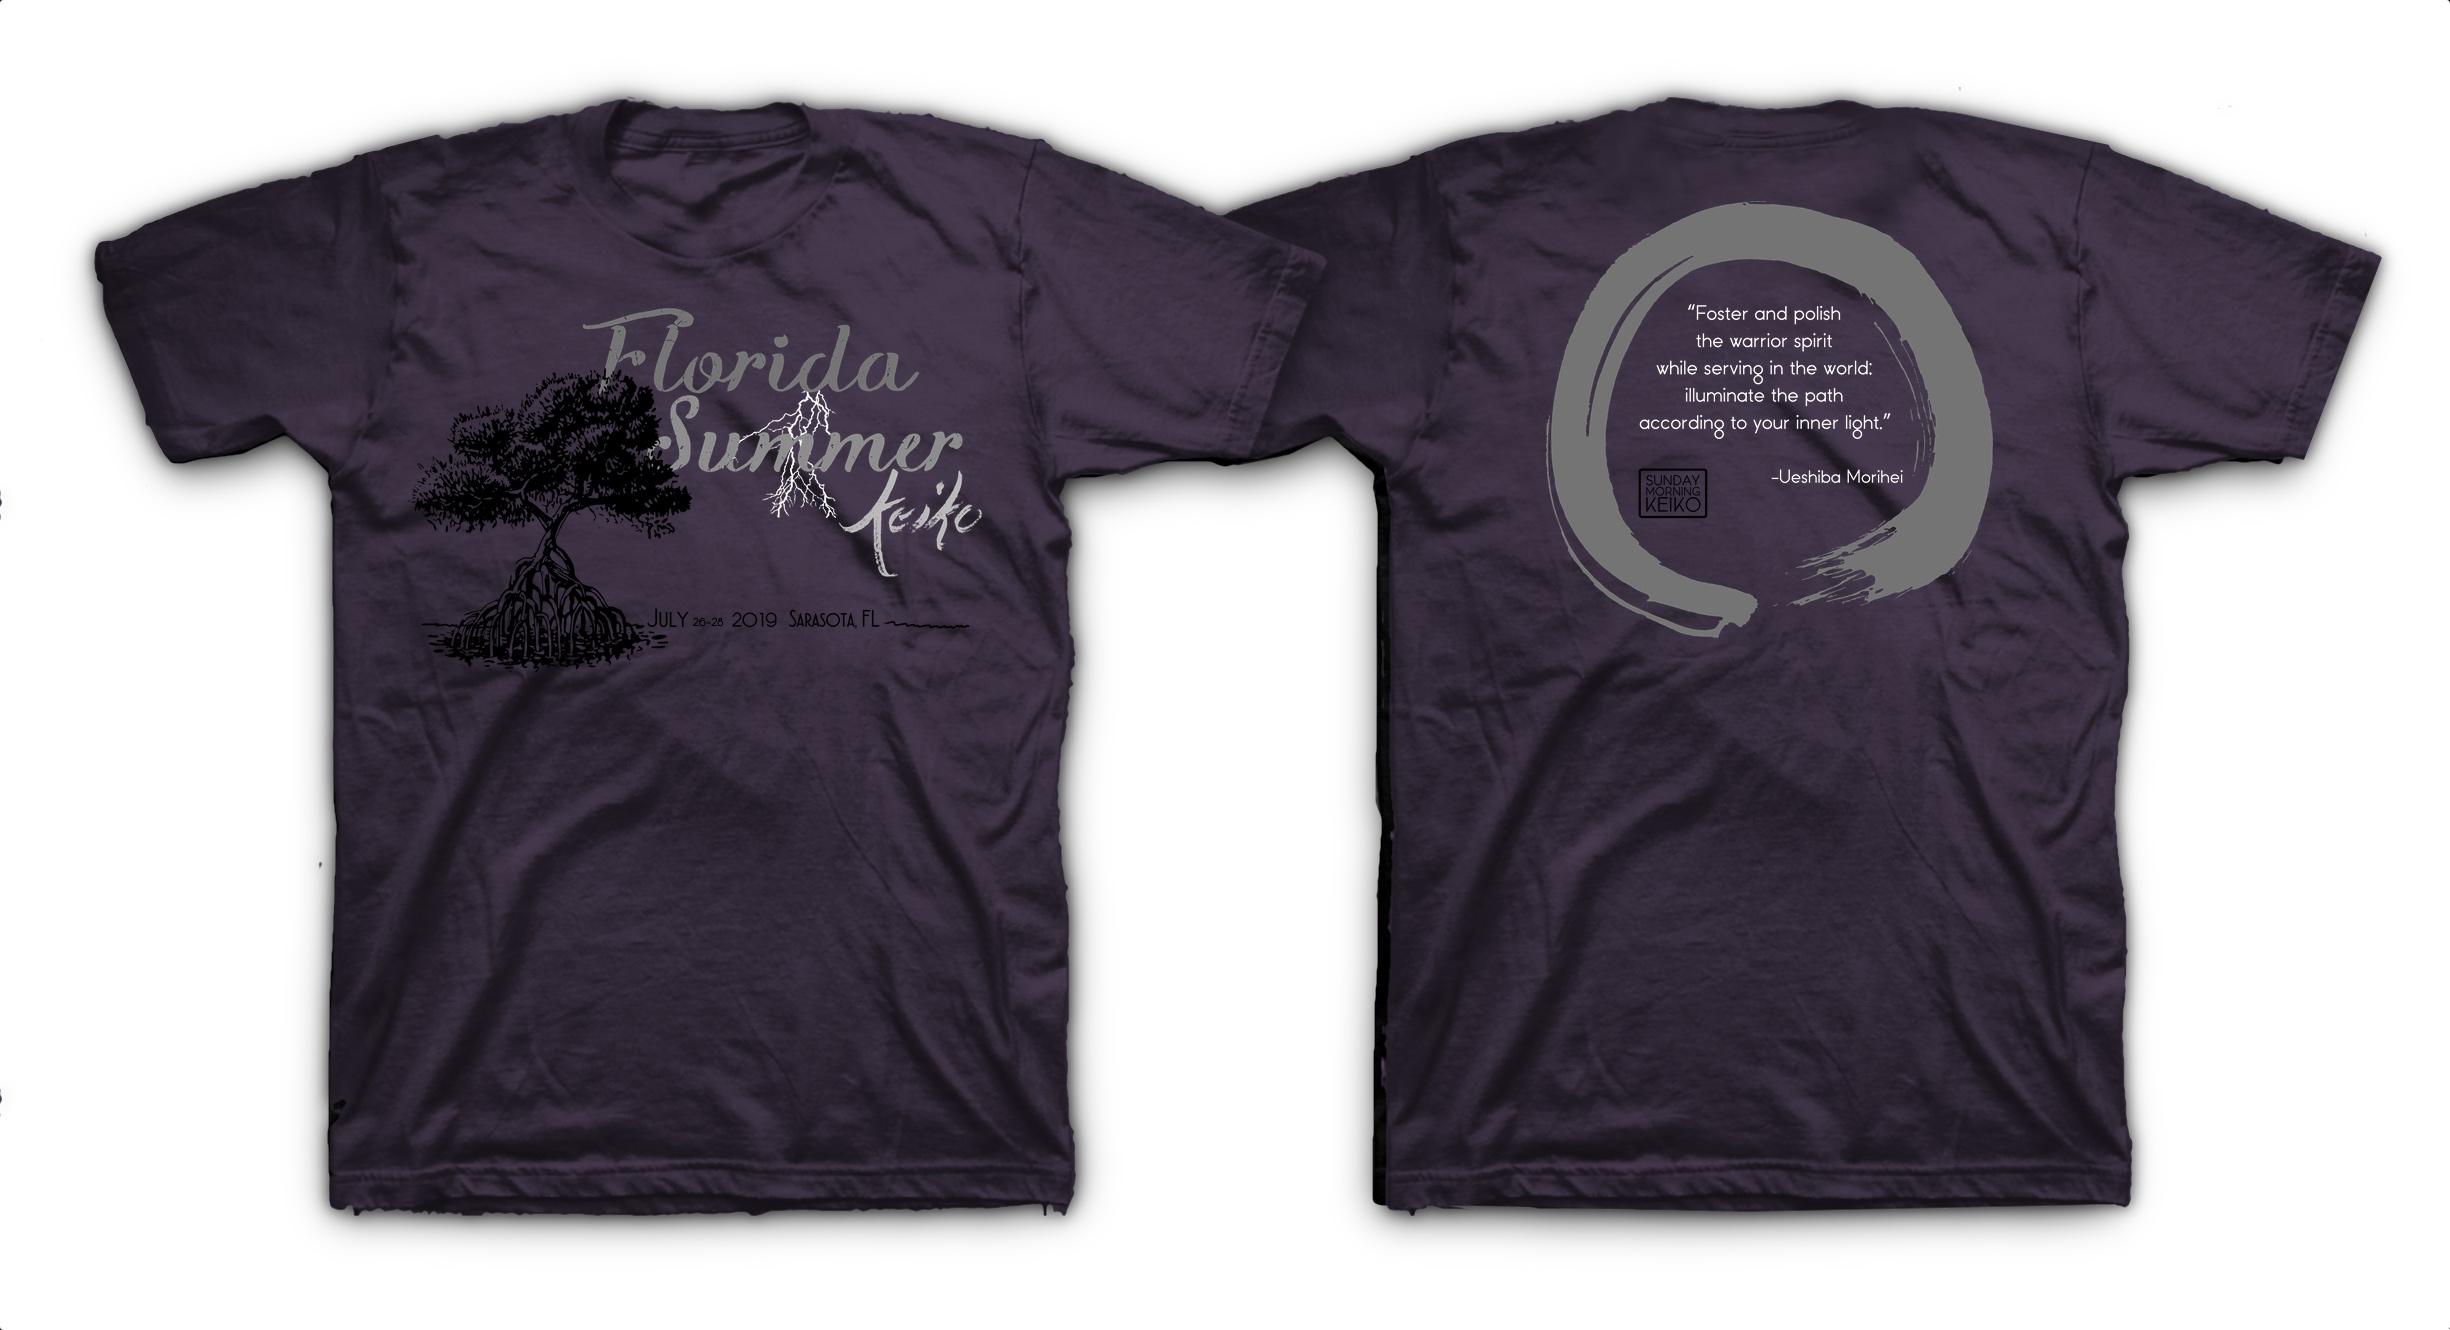 2019 Florida Summer Keiko Shirt Mockup.jpg